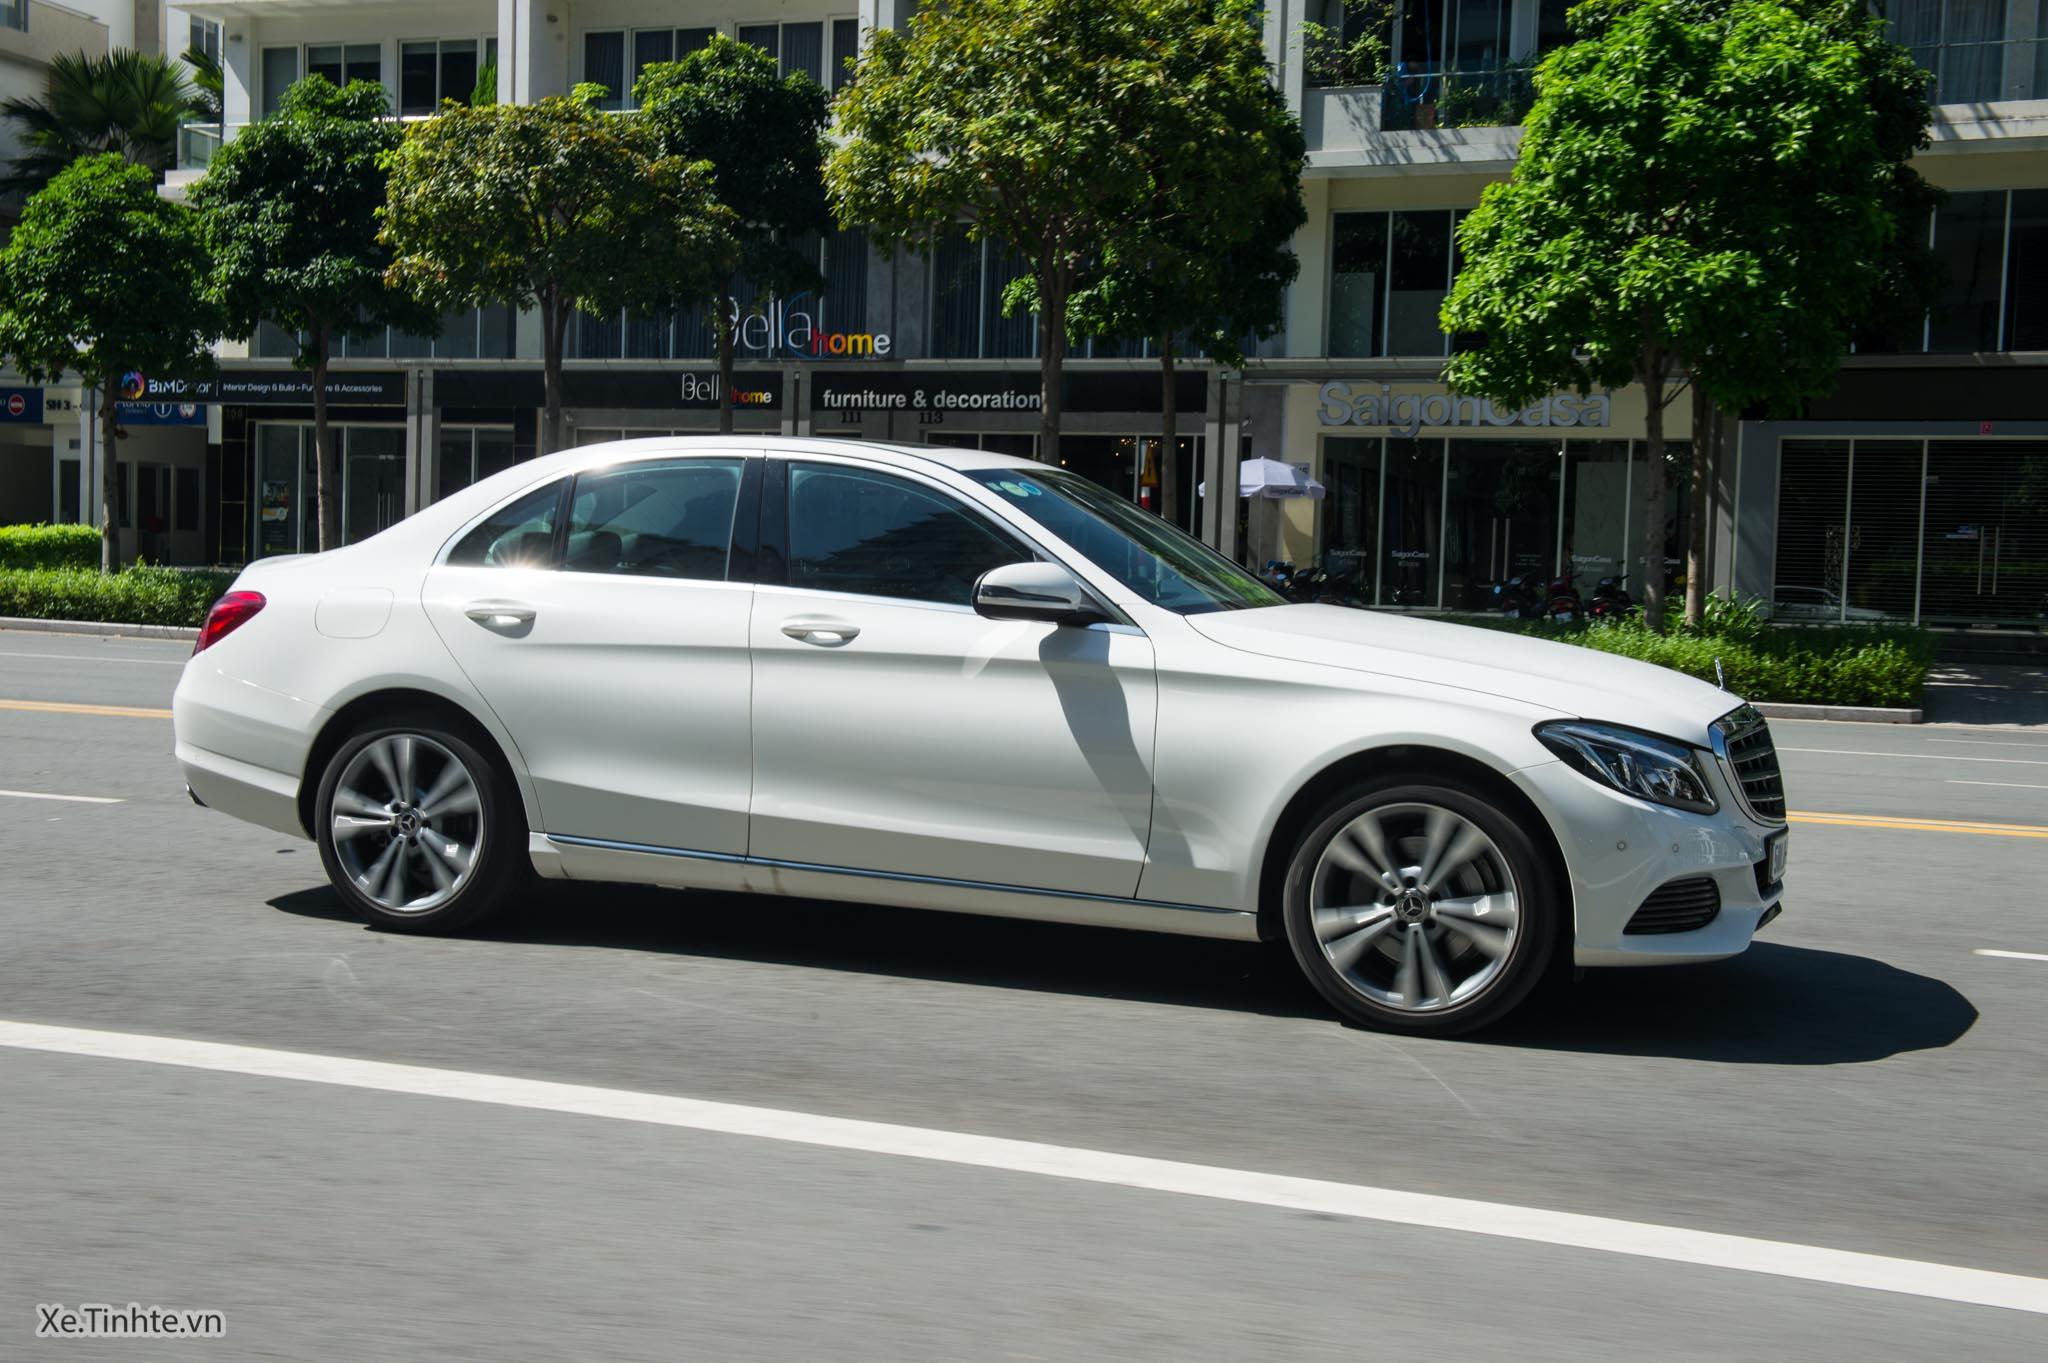 Mercedes_C250 Exclusive_Xe.tinhte.vn-7540.jpg